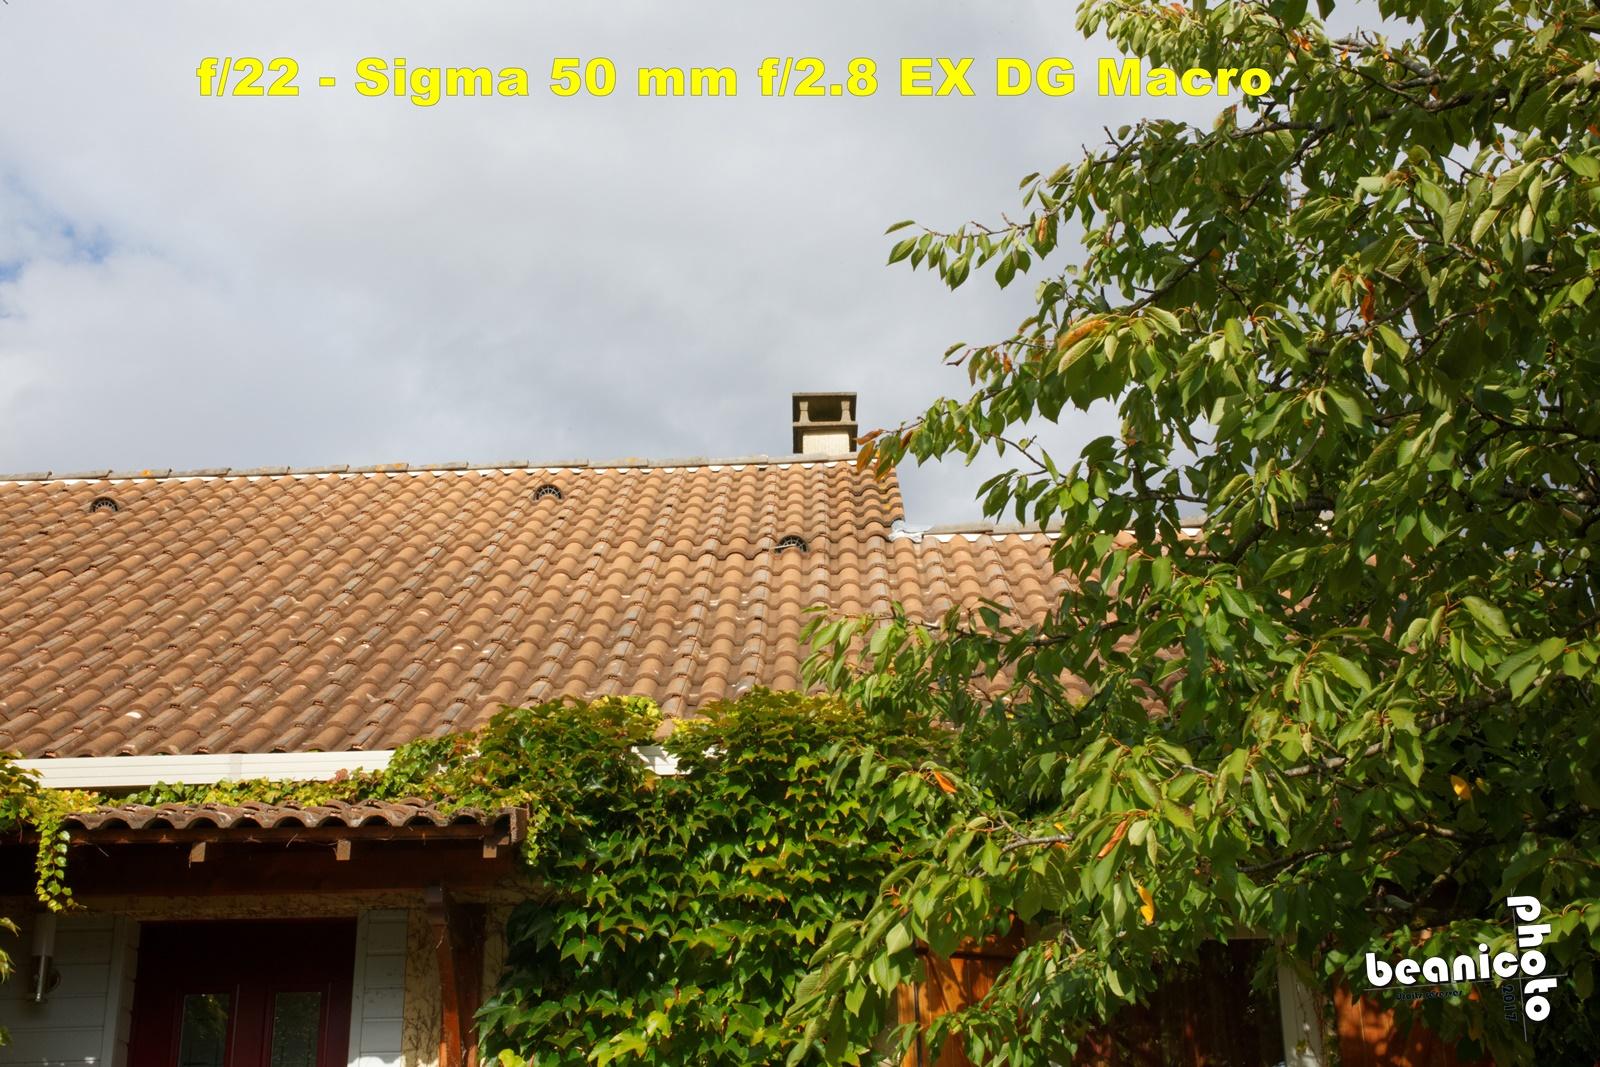 Canon 5DIII + Sigma 50 mm f/2.8 EX DG Macro - f/22 1/125 ISO400 - beanico-photo